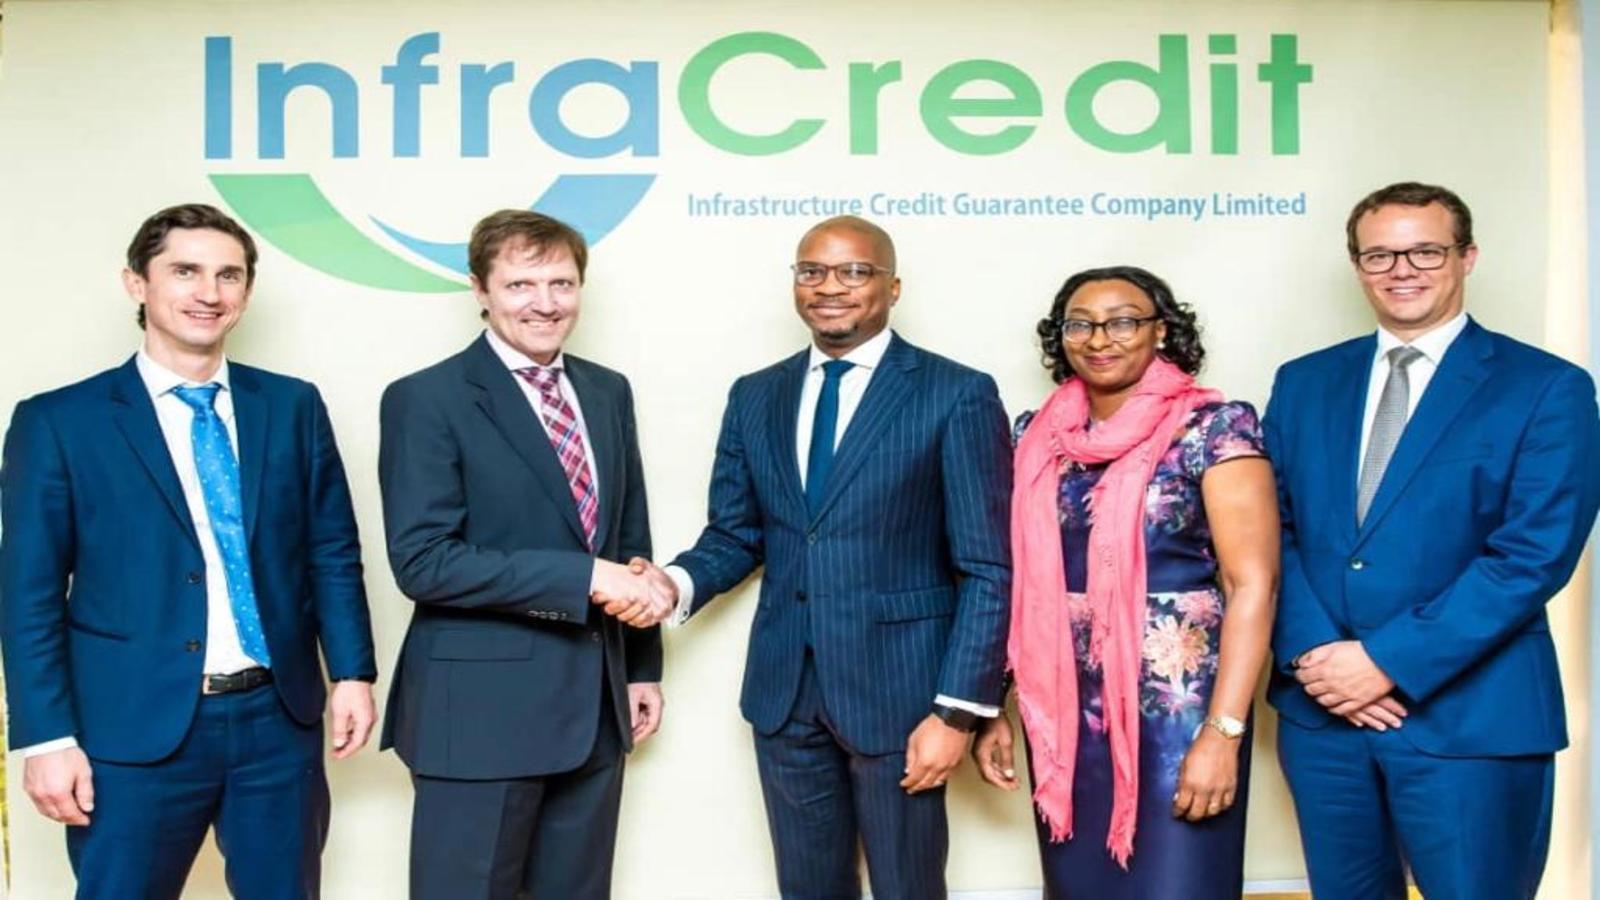 Infrastructure Credit Guarantee Company - Investors King